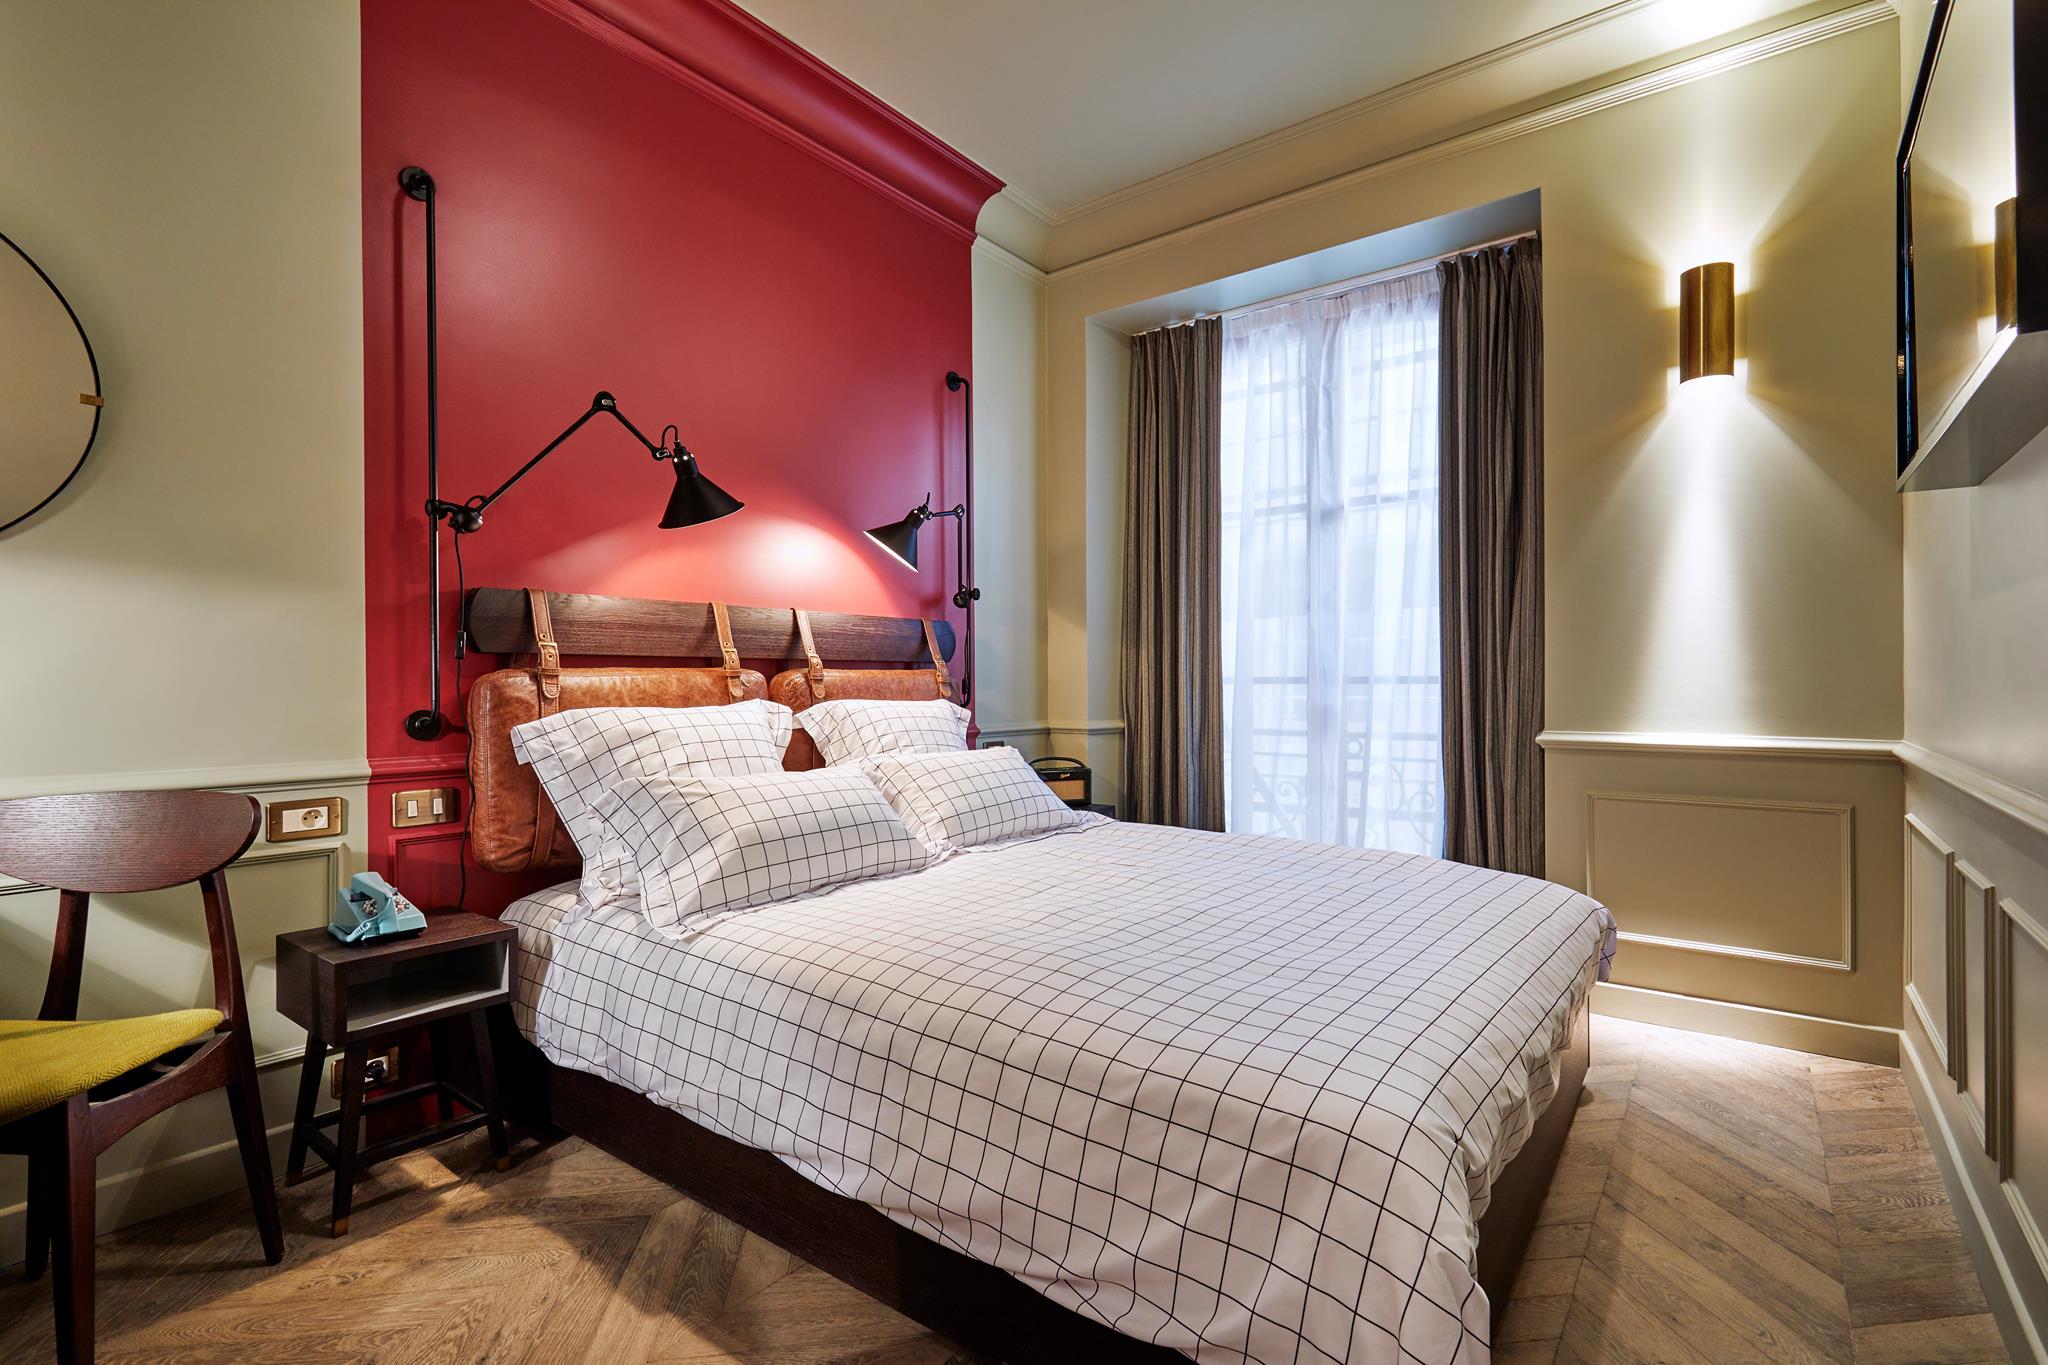 THE_HOXTON_PARIS_HOTEL_WEEKEND1.jpg